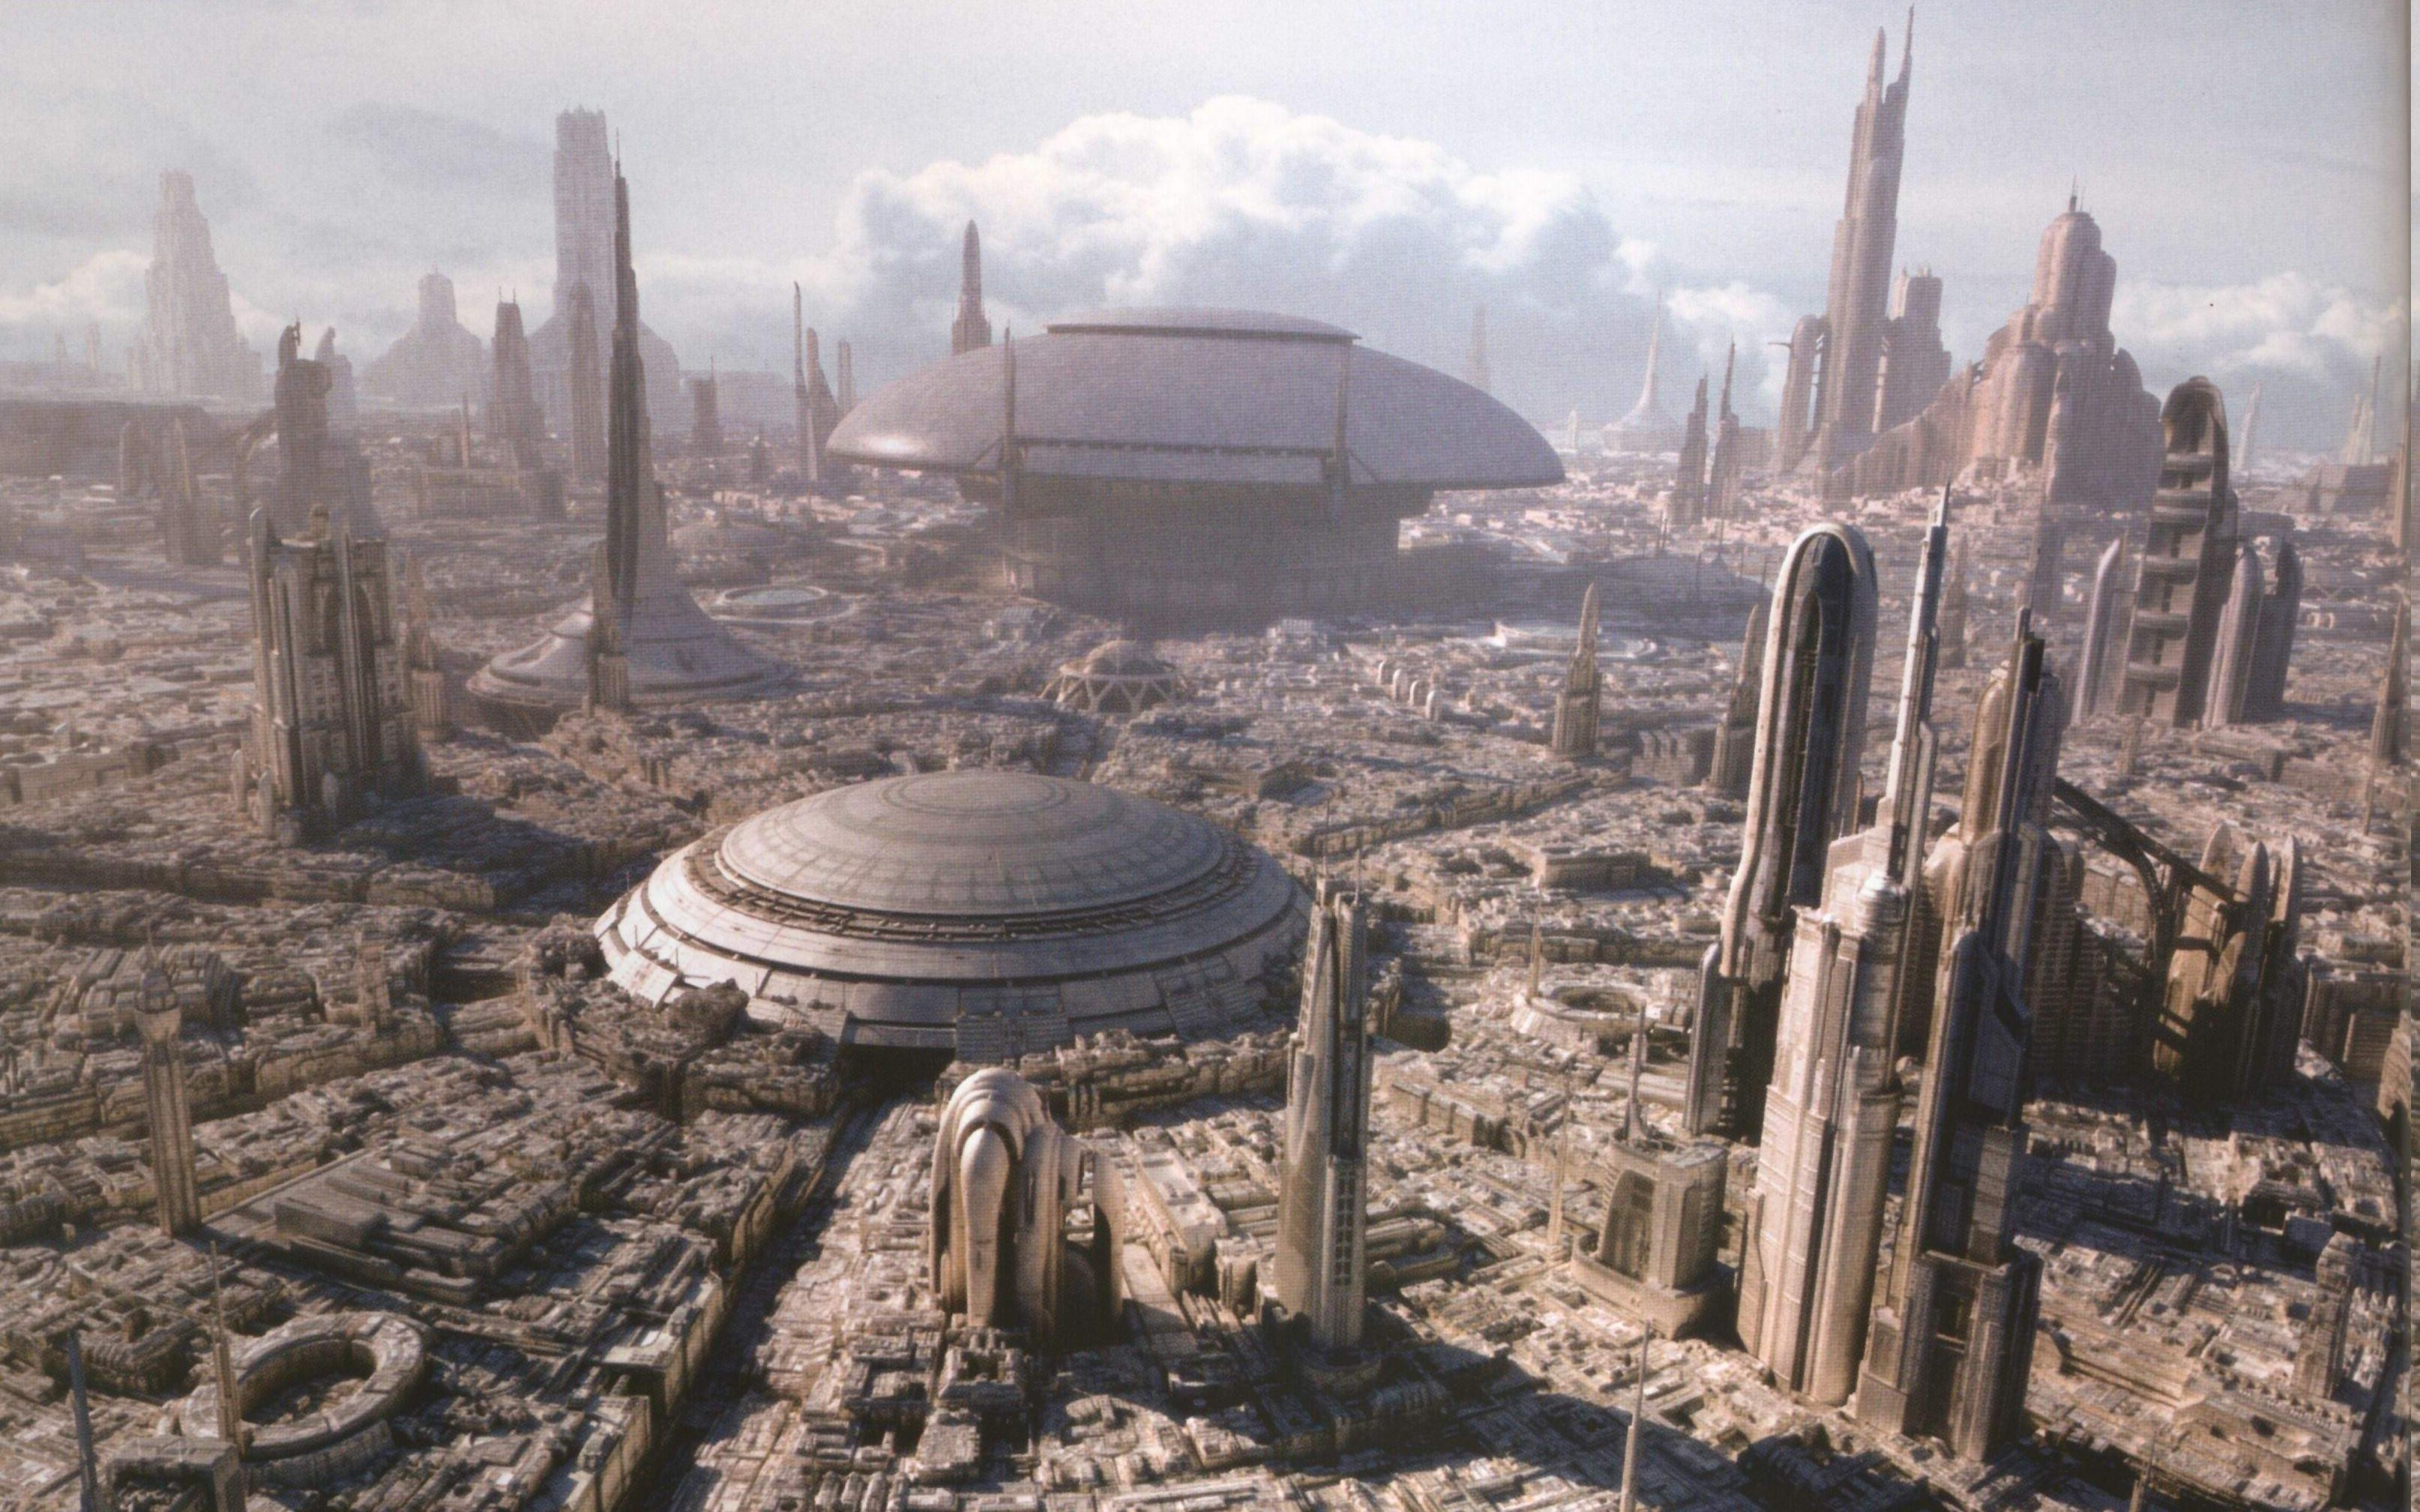 3228x2017 Star Wars Coruscant Science Fiction Wallpapers 3228x2017 Wallpaper Teahub Io